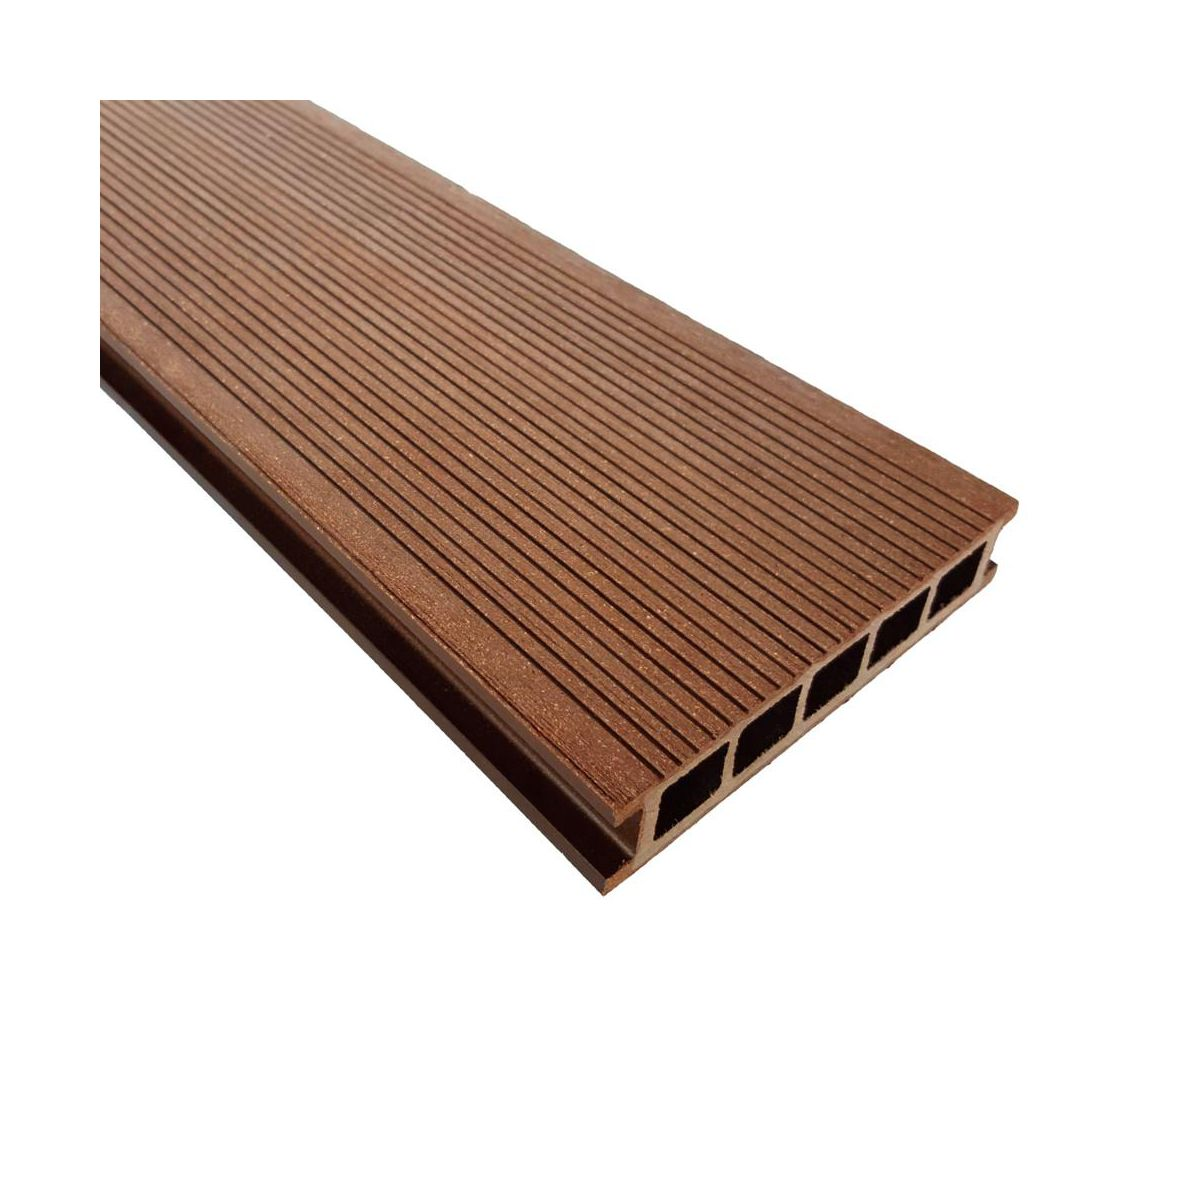 Deska Tarasowa Kompozytowa Gama Redwood